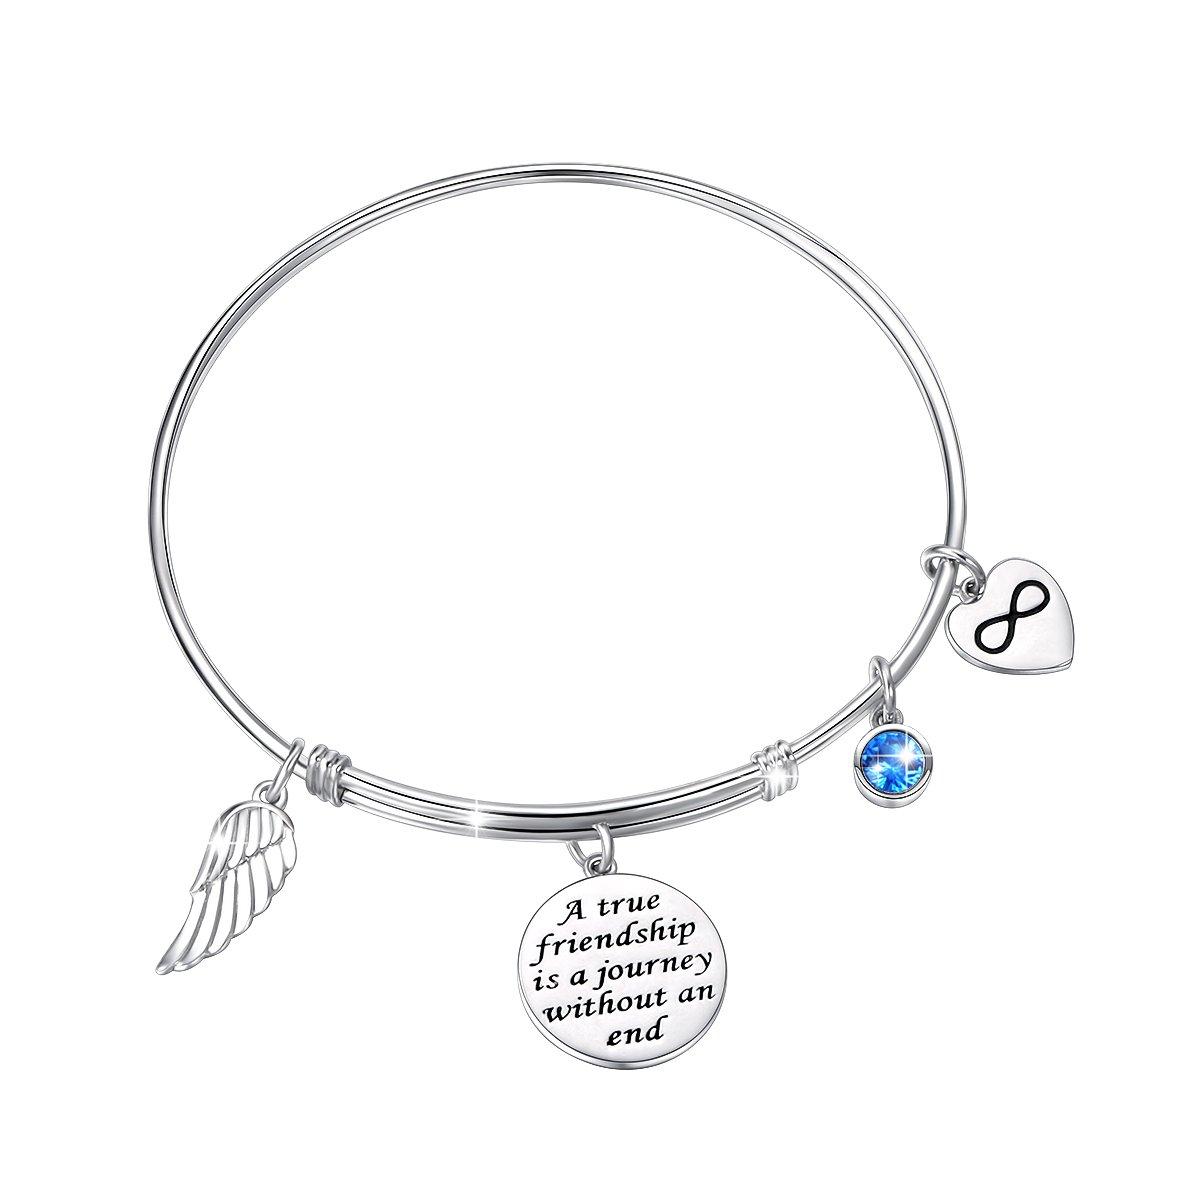 JZMSJF for Friends CZ Bracelet 925 Sterling Silver Expandable Inspirational  Motivational/Friendship Meaningful/Love/Memorial Thankful